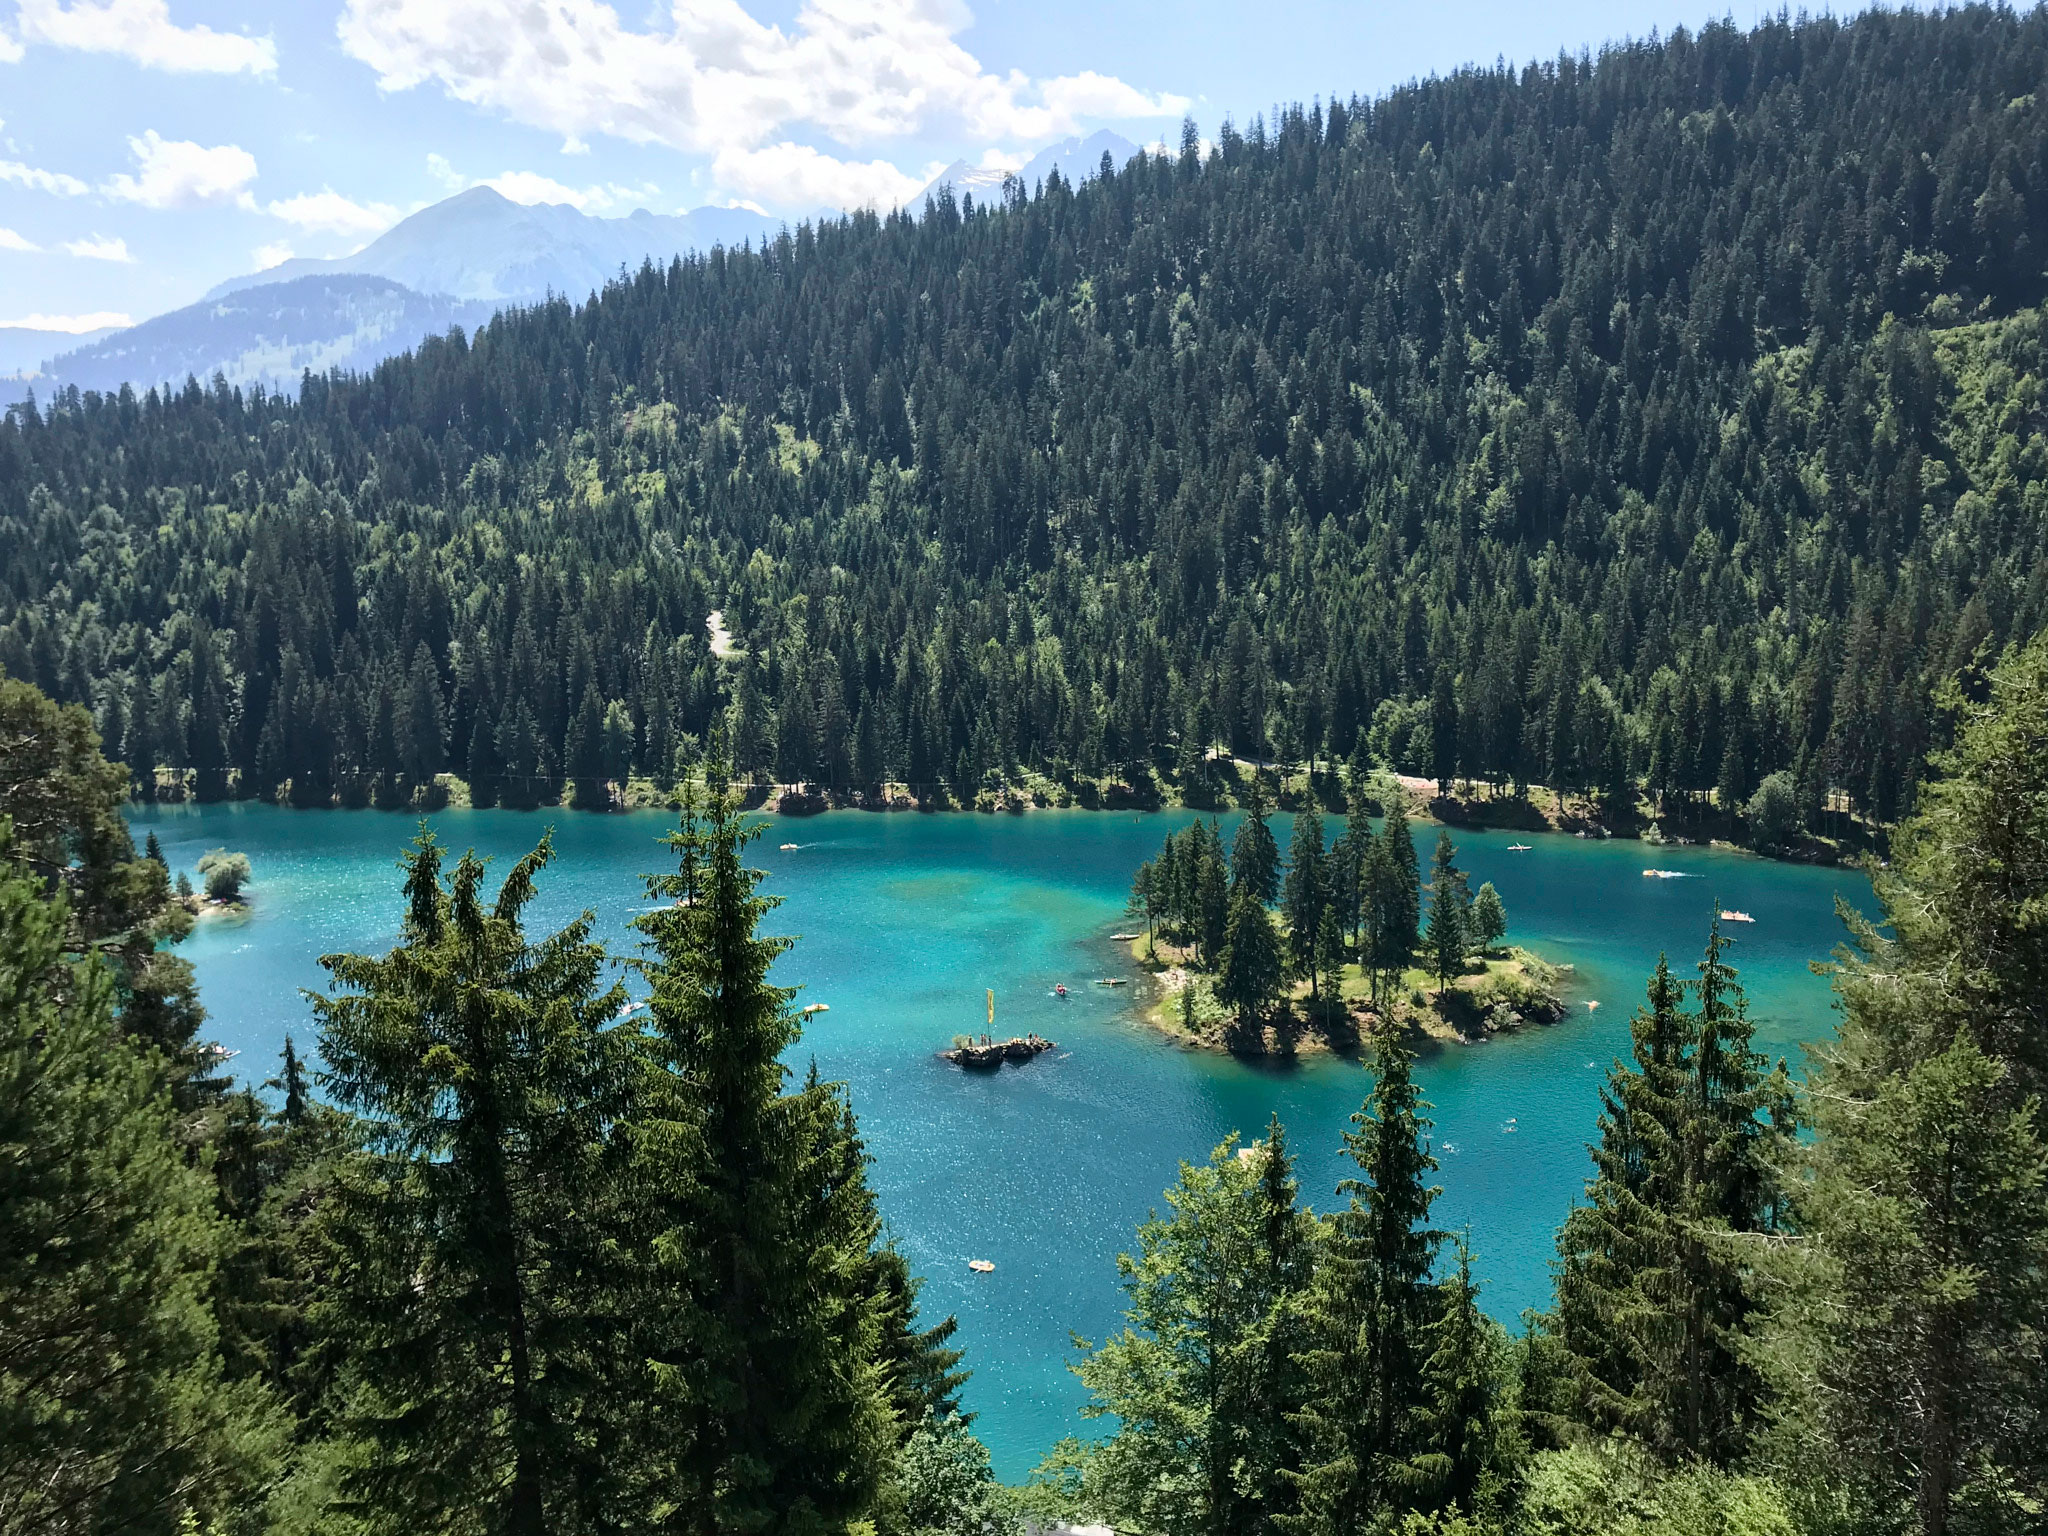 Hiking the Swiss Alps